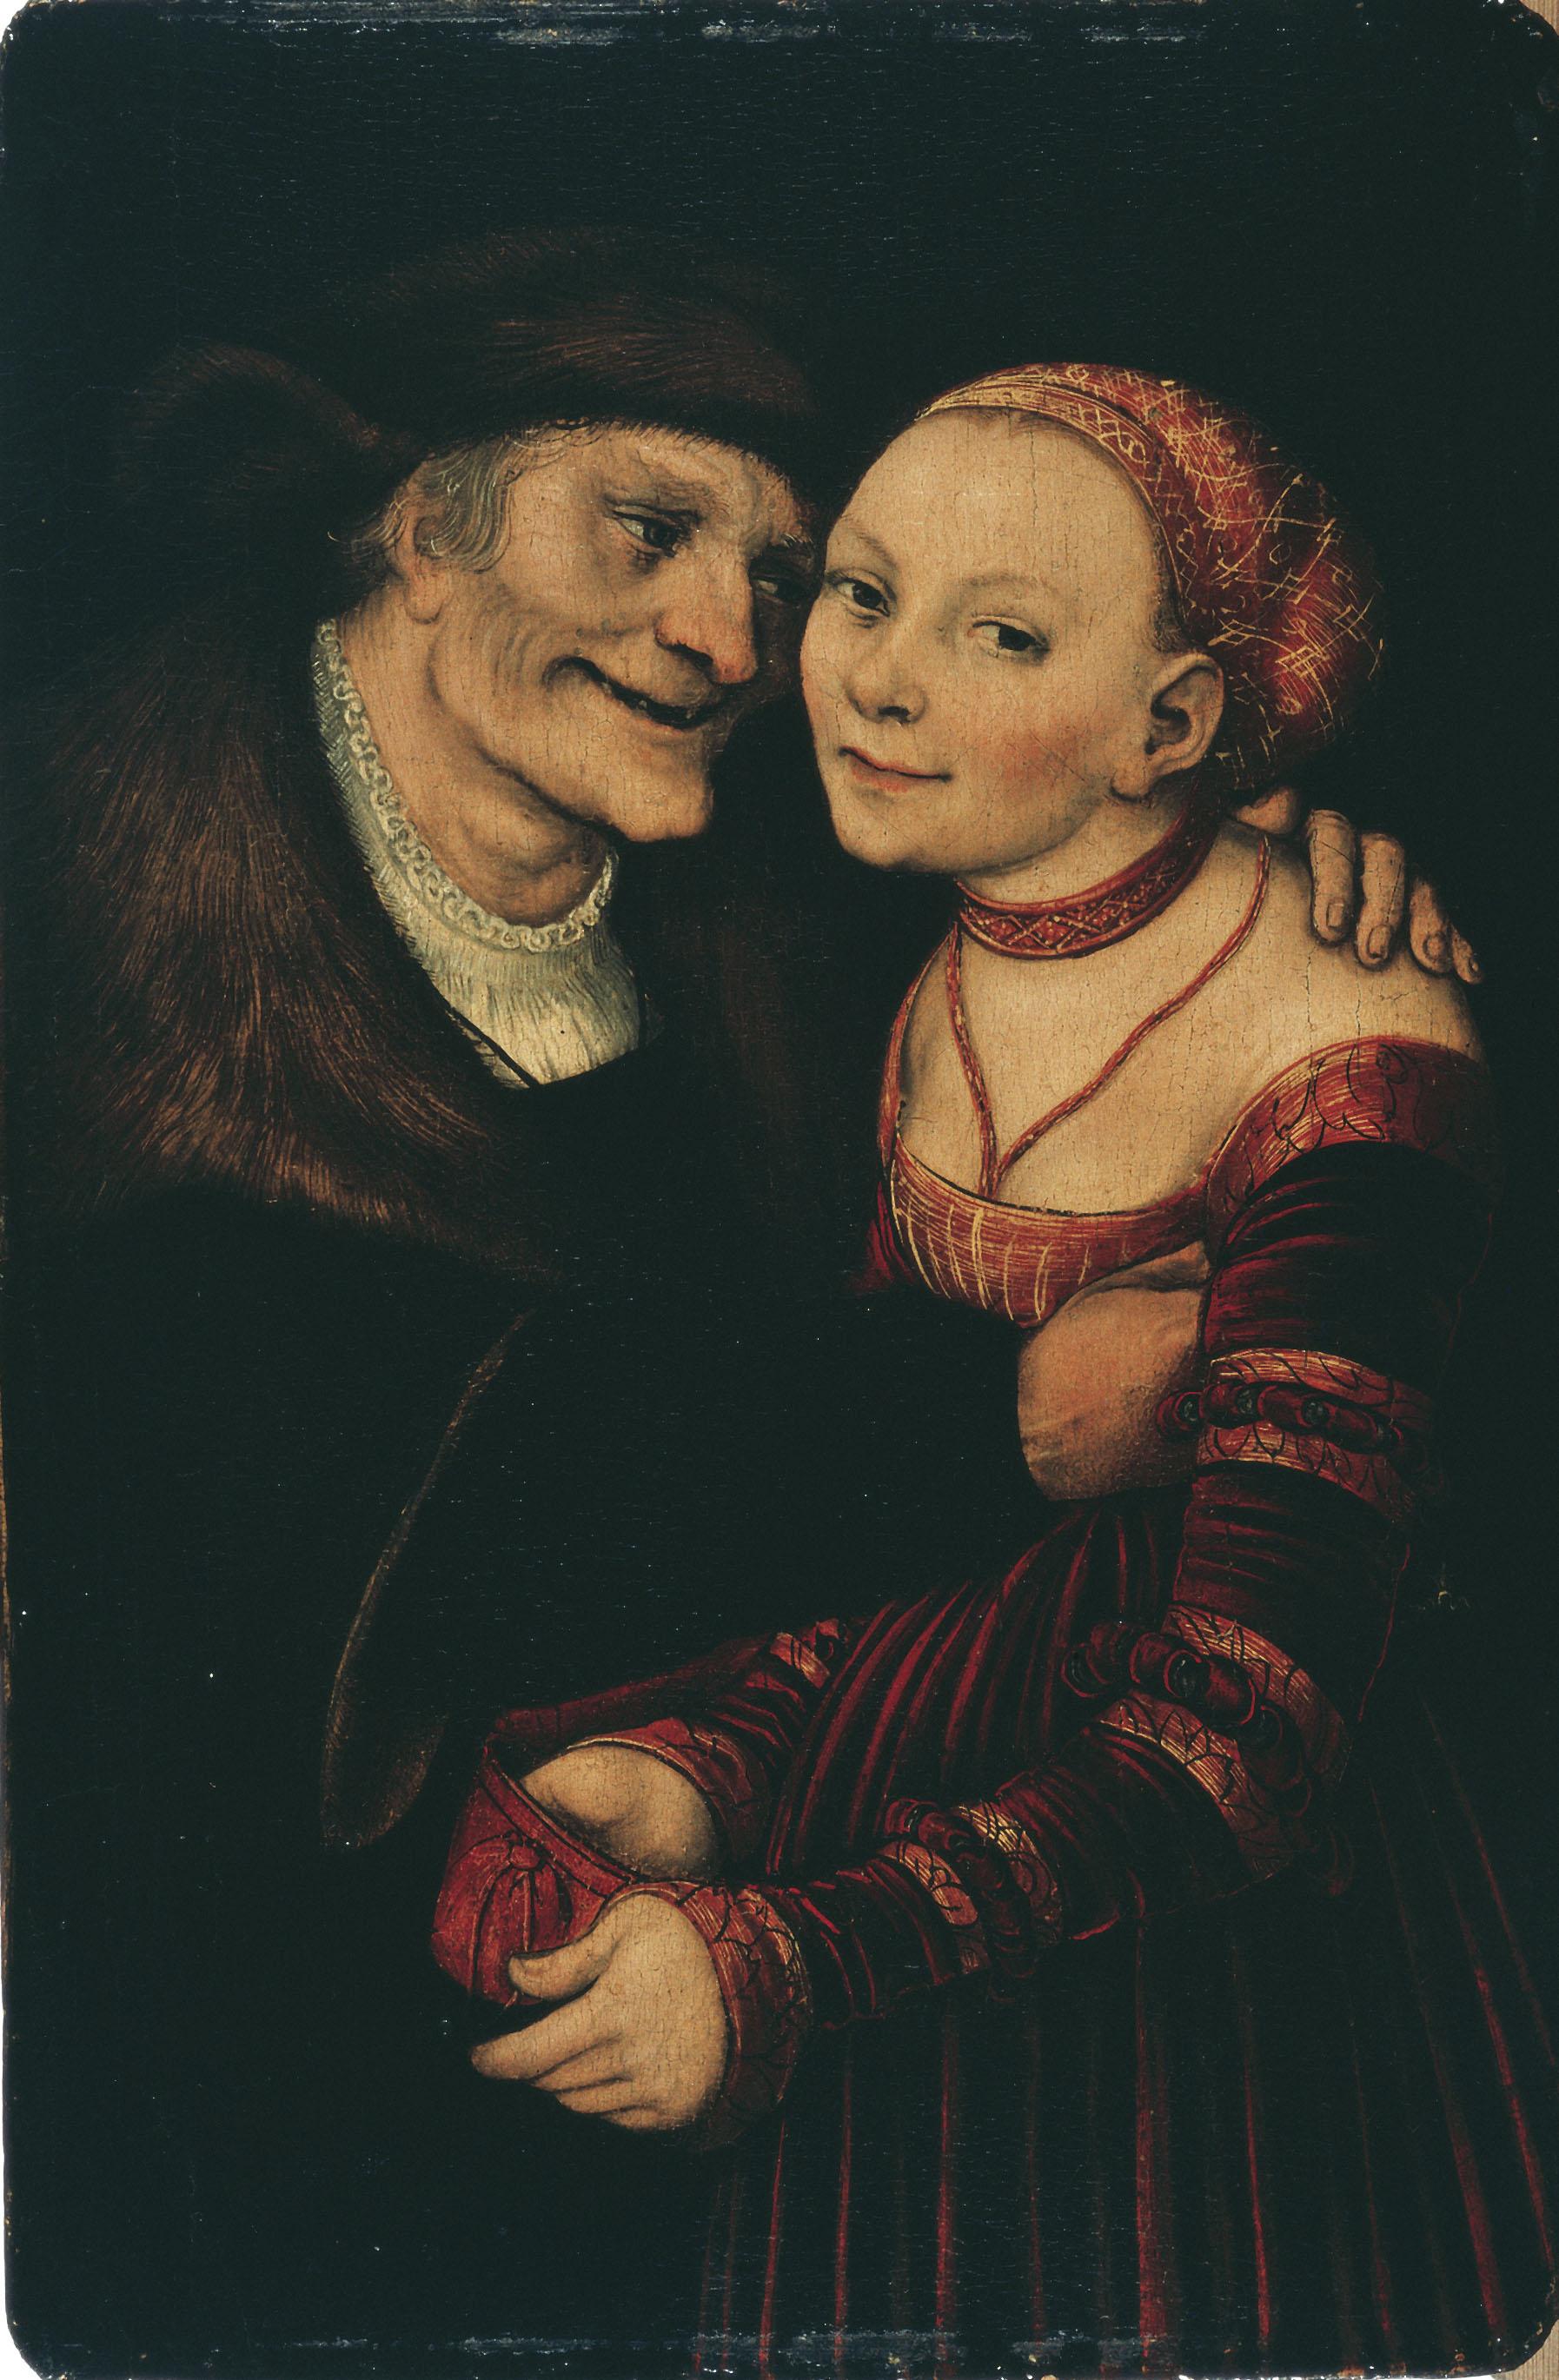 Lucas Cranach (El Vell), Parella amorosa desigual, 1547